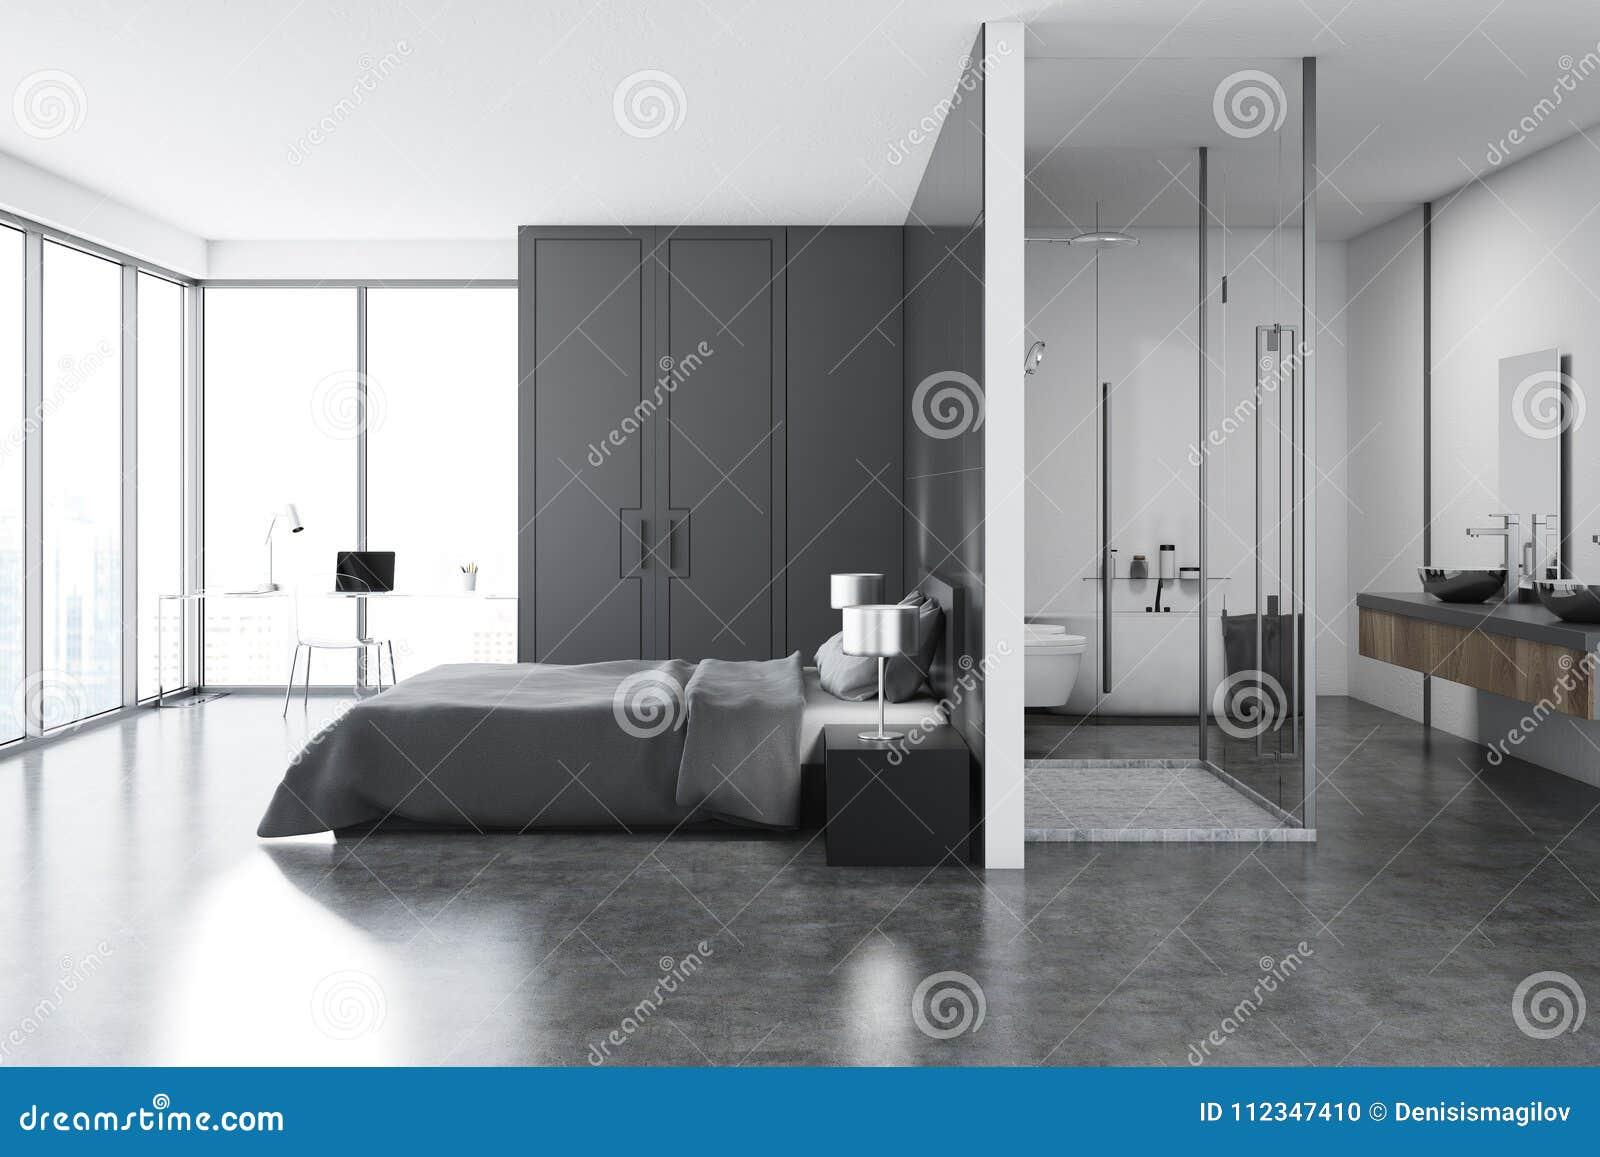 Luxury Bedroom And Bathroom Interior Stock Illustration